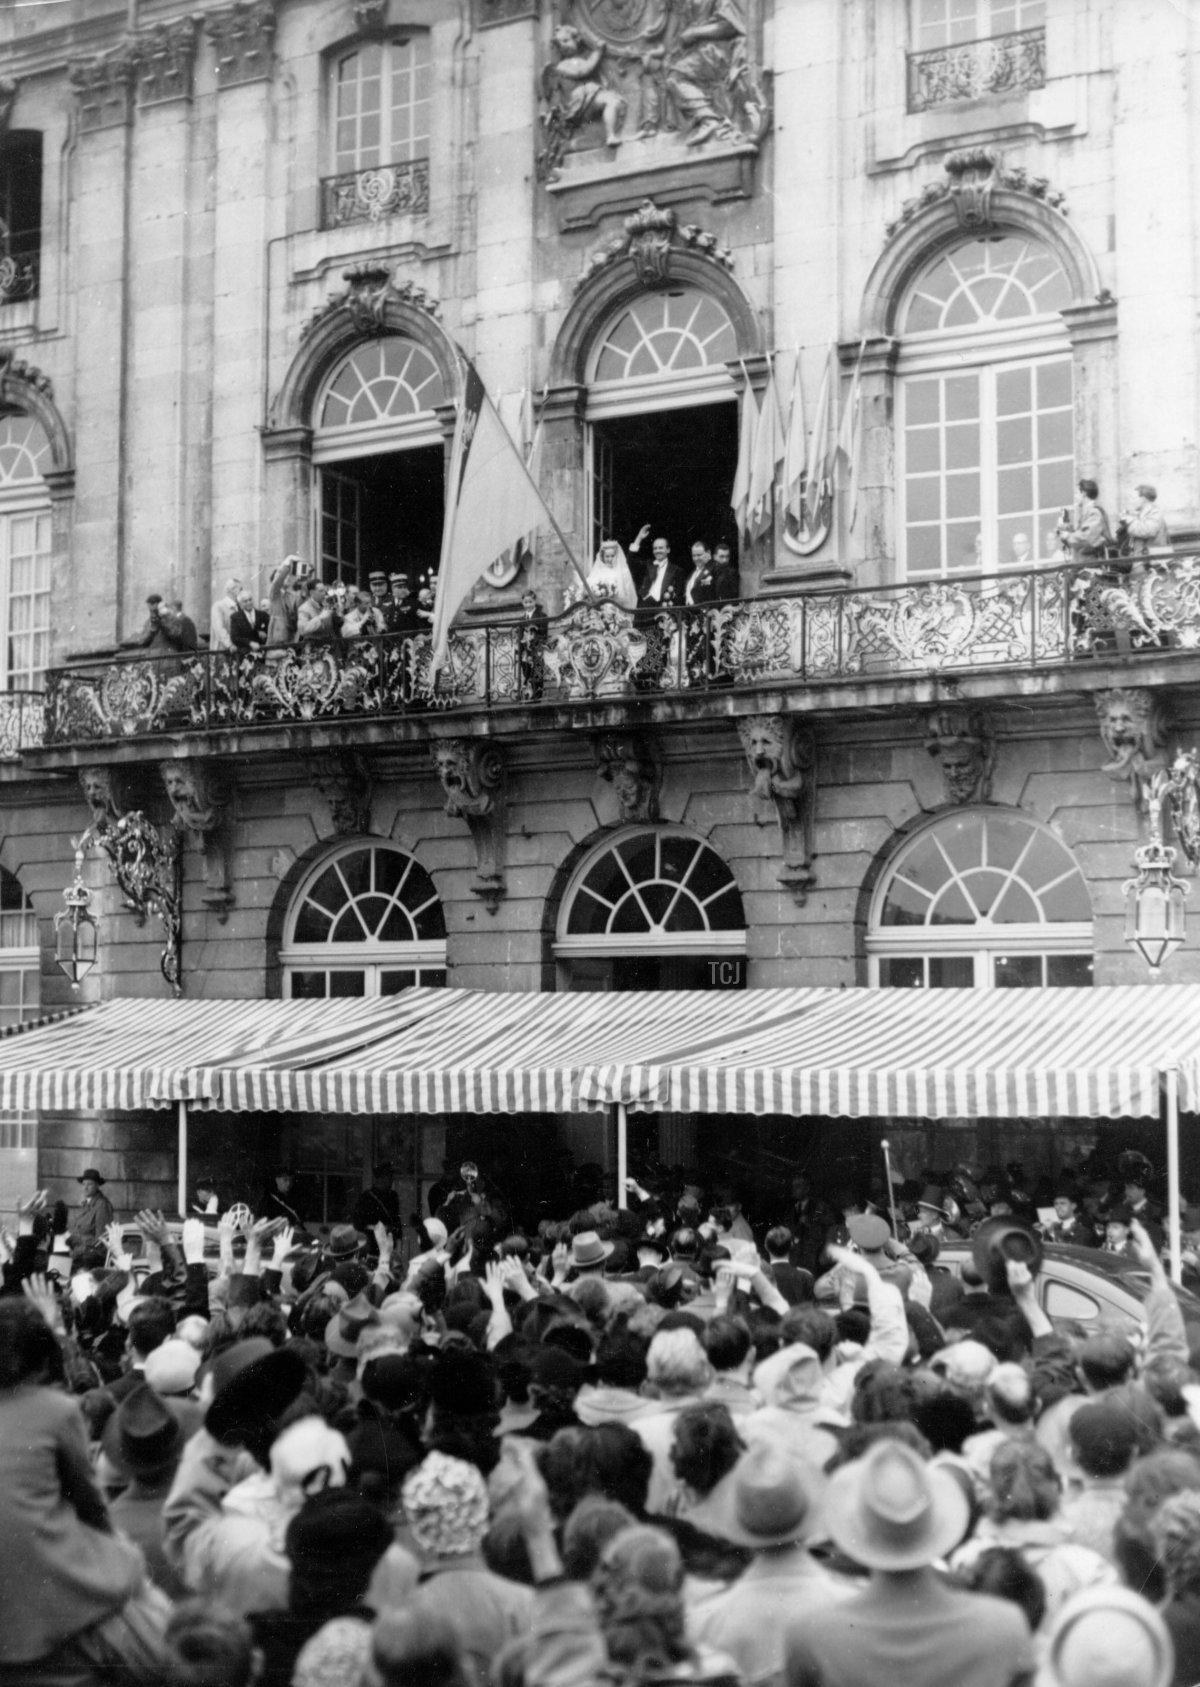 Archduke Otto and Archduchess Regina appear on the balcony following their wedding